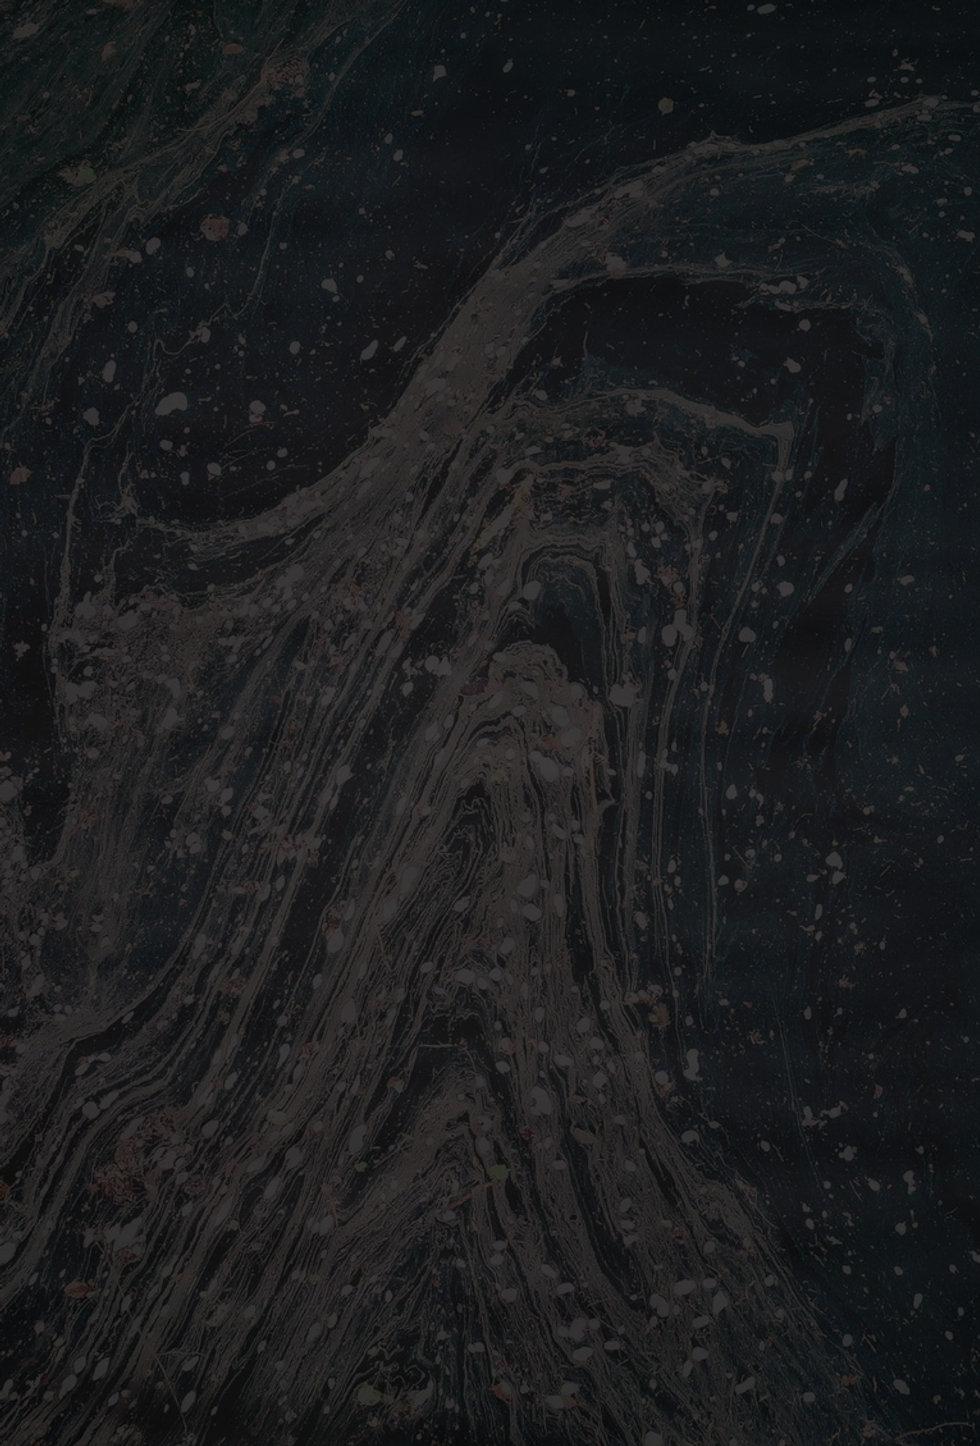 gray_floor_texture-wallpaper-2560x1600_e